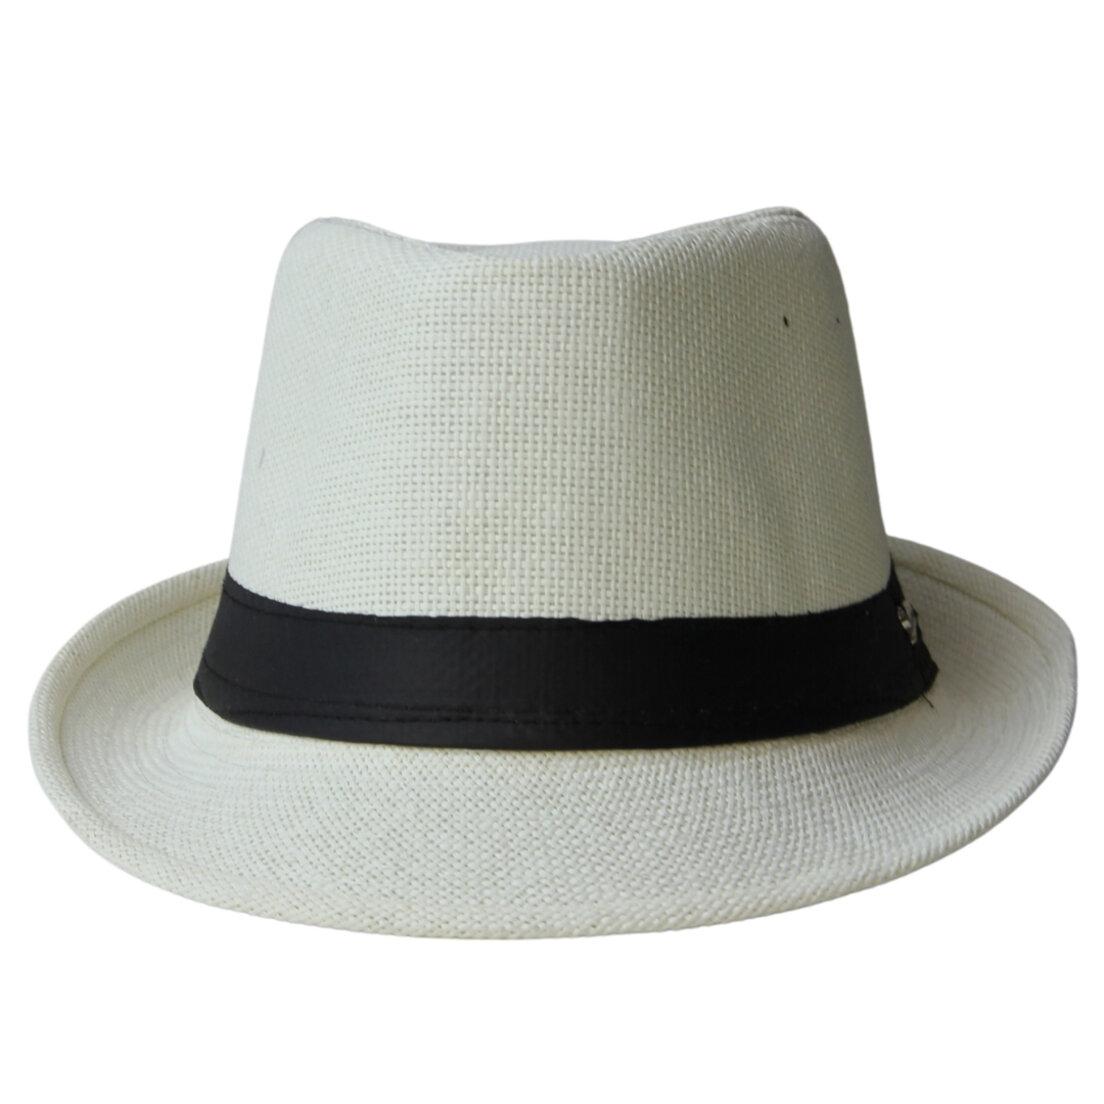 Chapéu teste